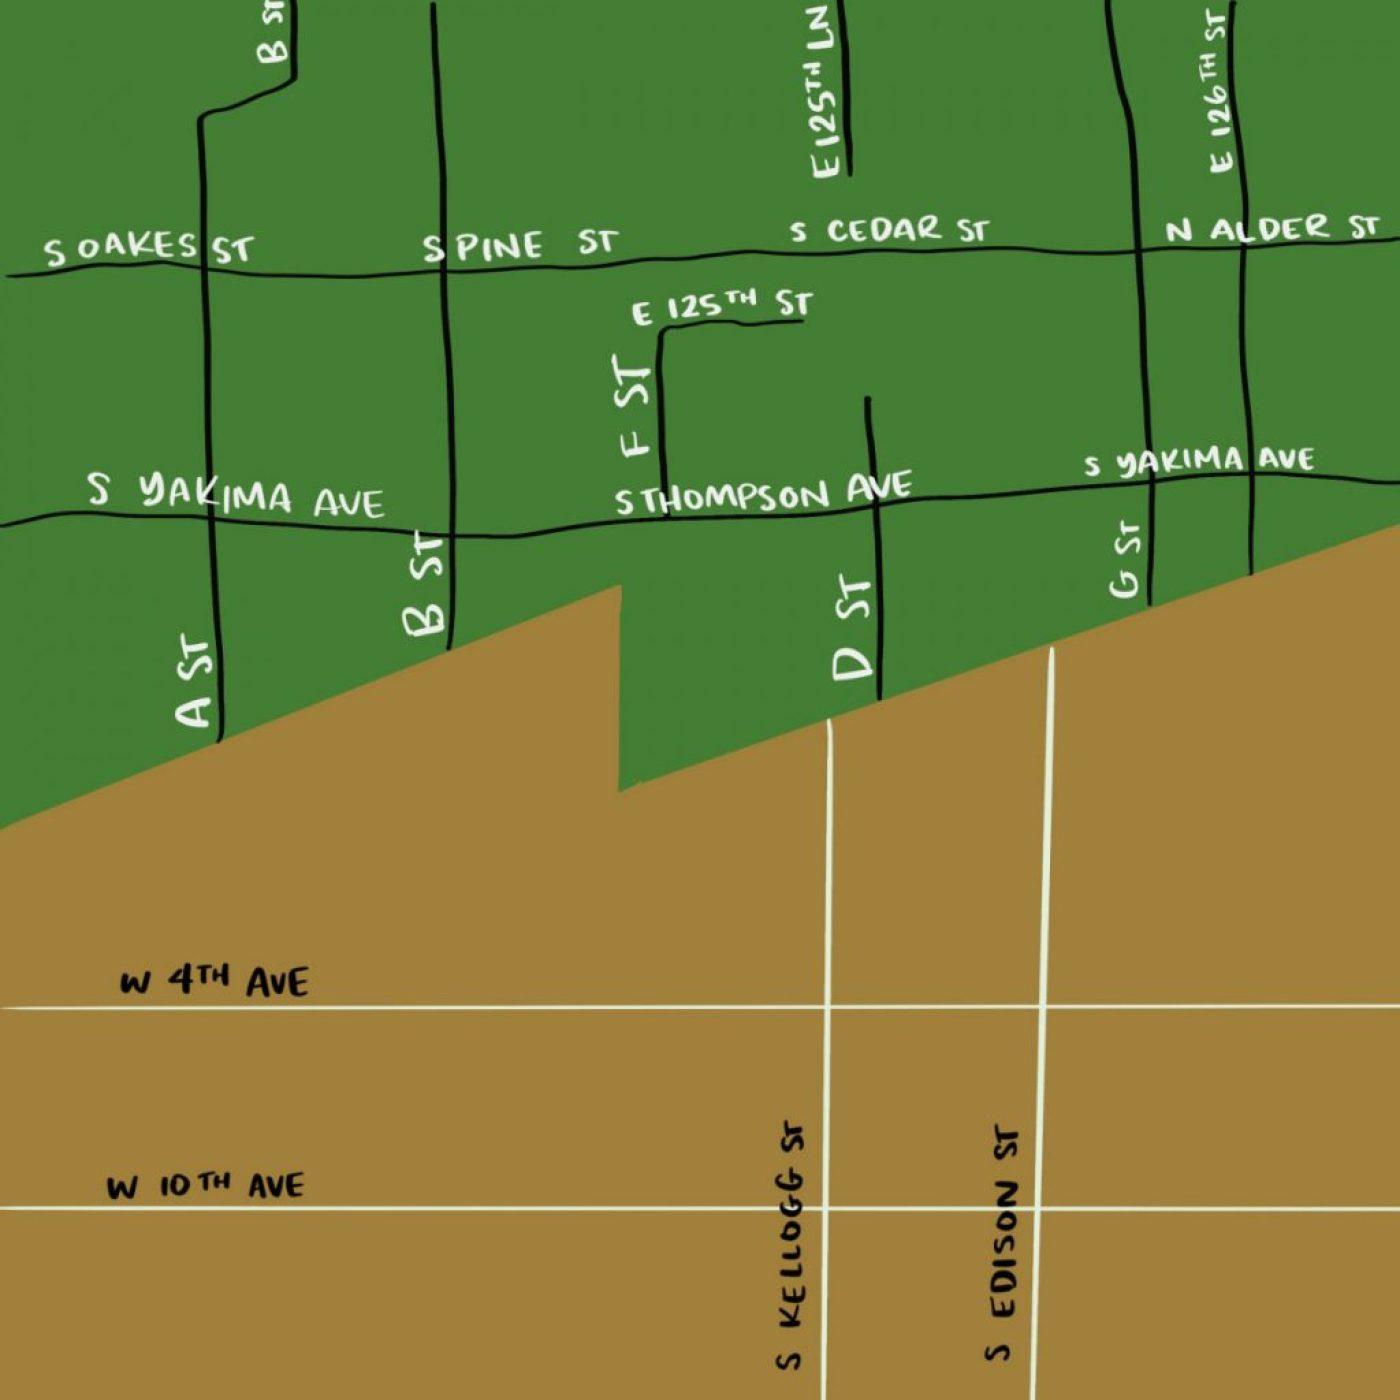 Tacoma-Kennewick streets